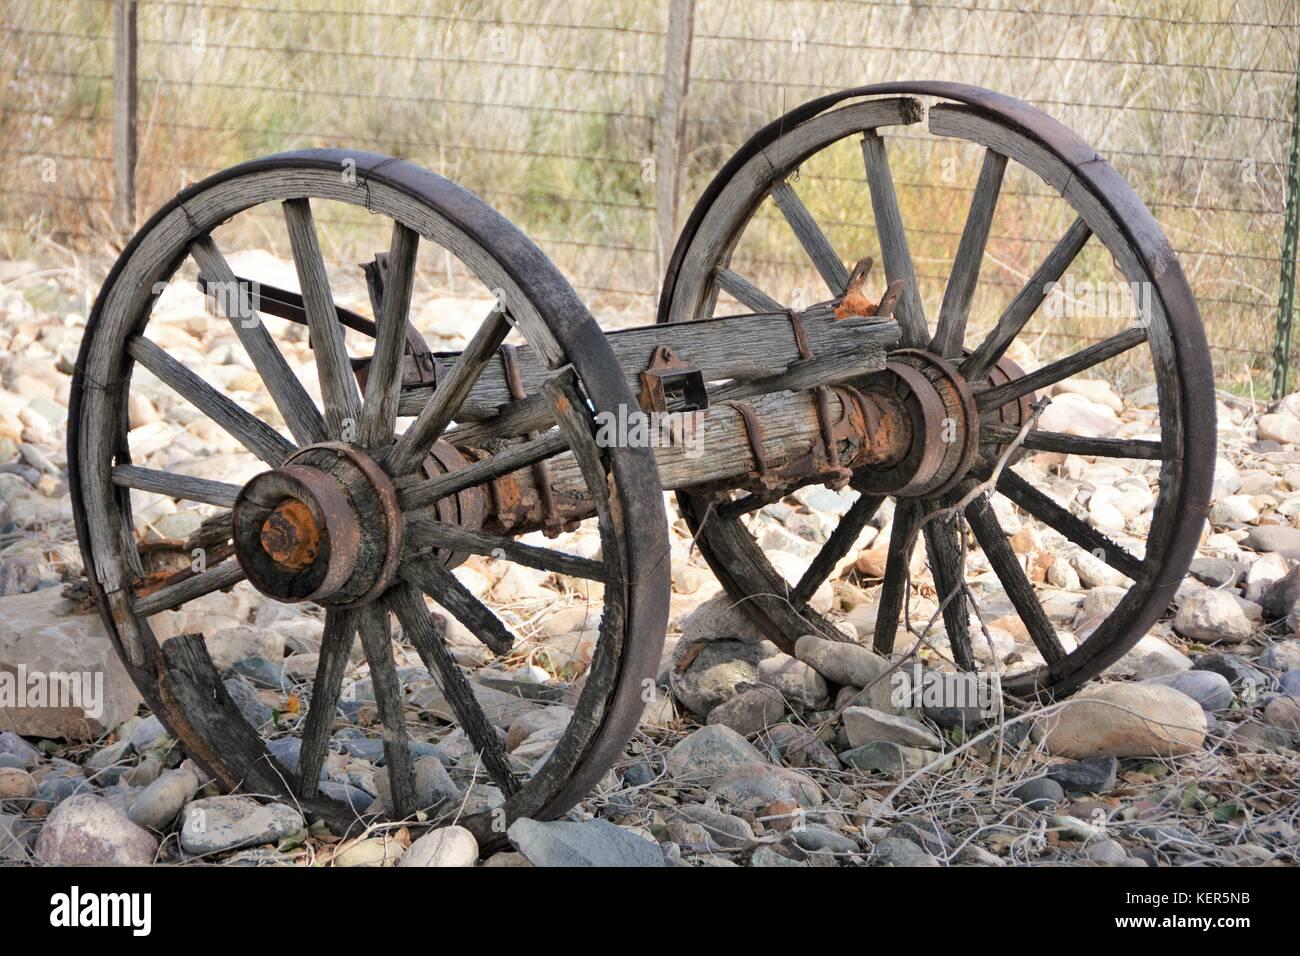 Marvelous Old Wagon Wheels   Stock Image